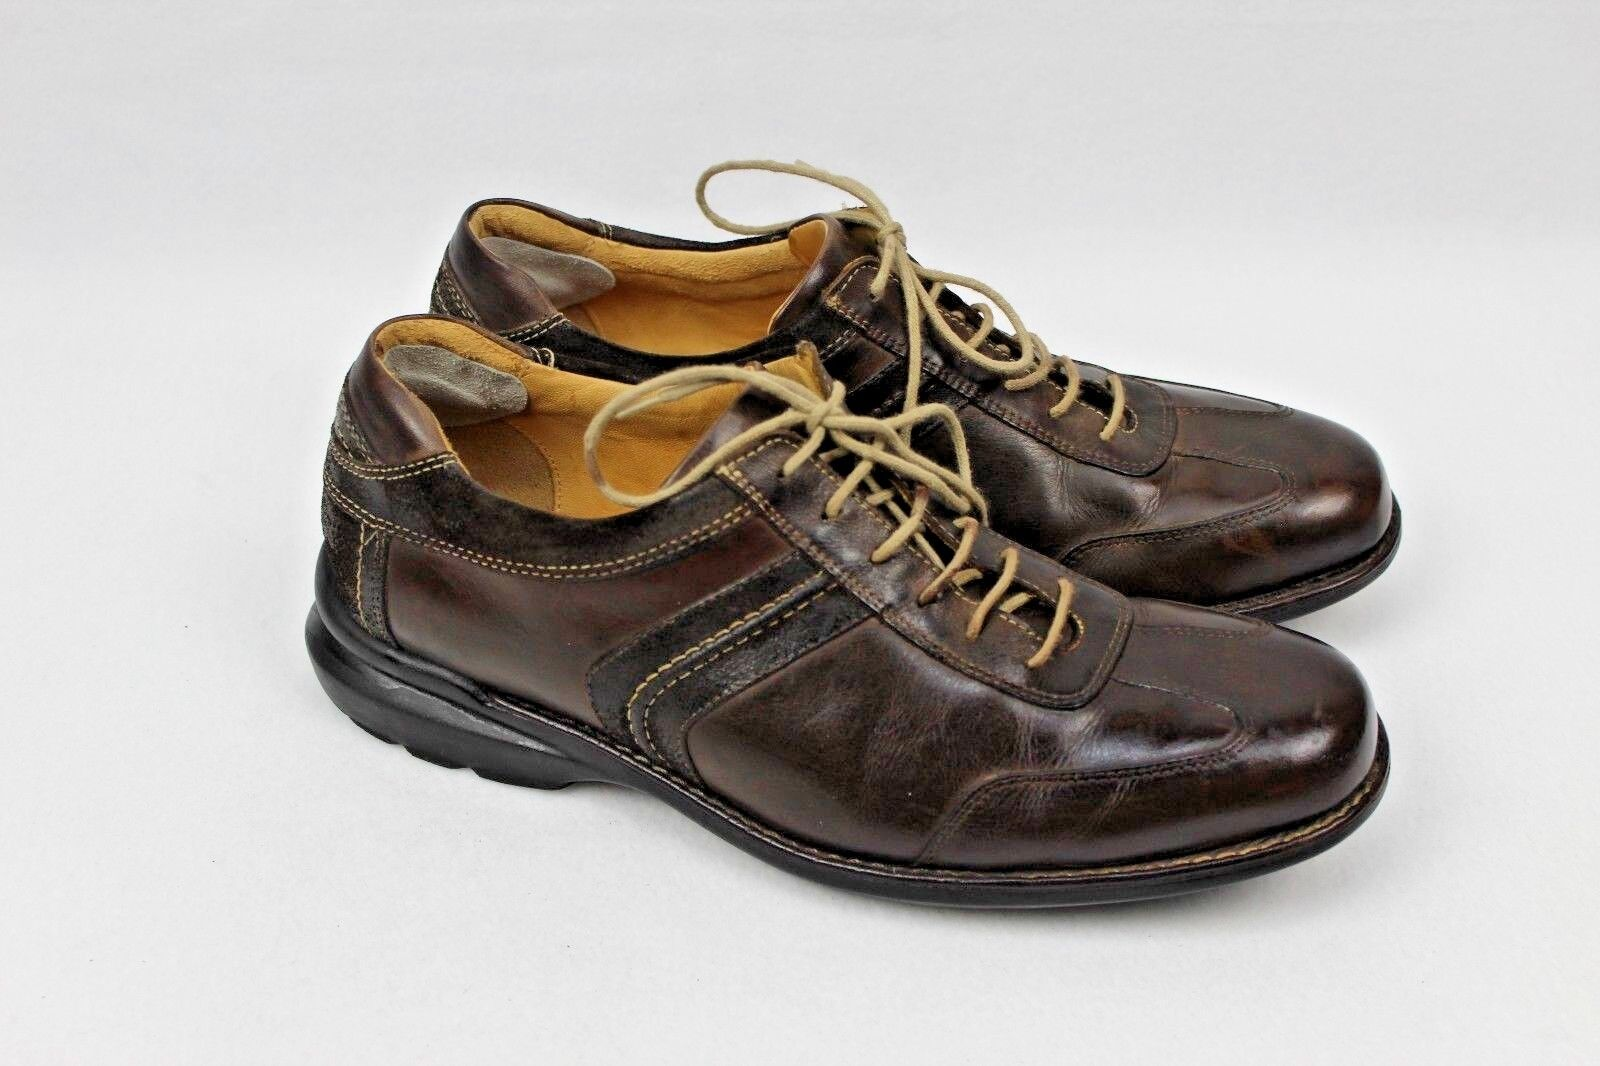 Johnston Murphy Men's Leather Lace Up Shoes Style 20-7472 Suede Trim Size 11 M